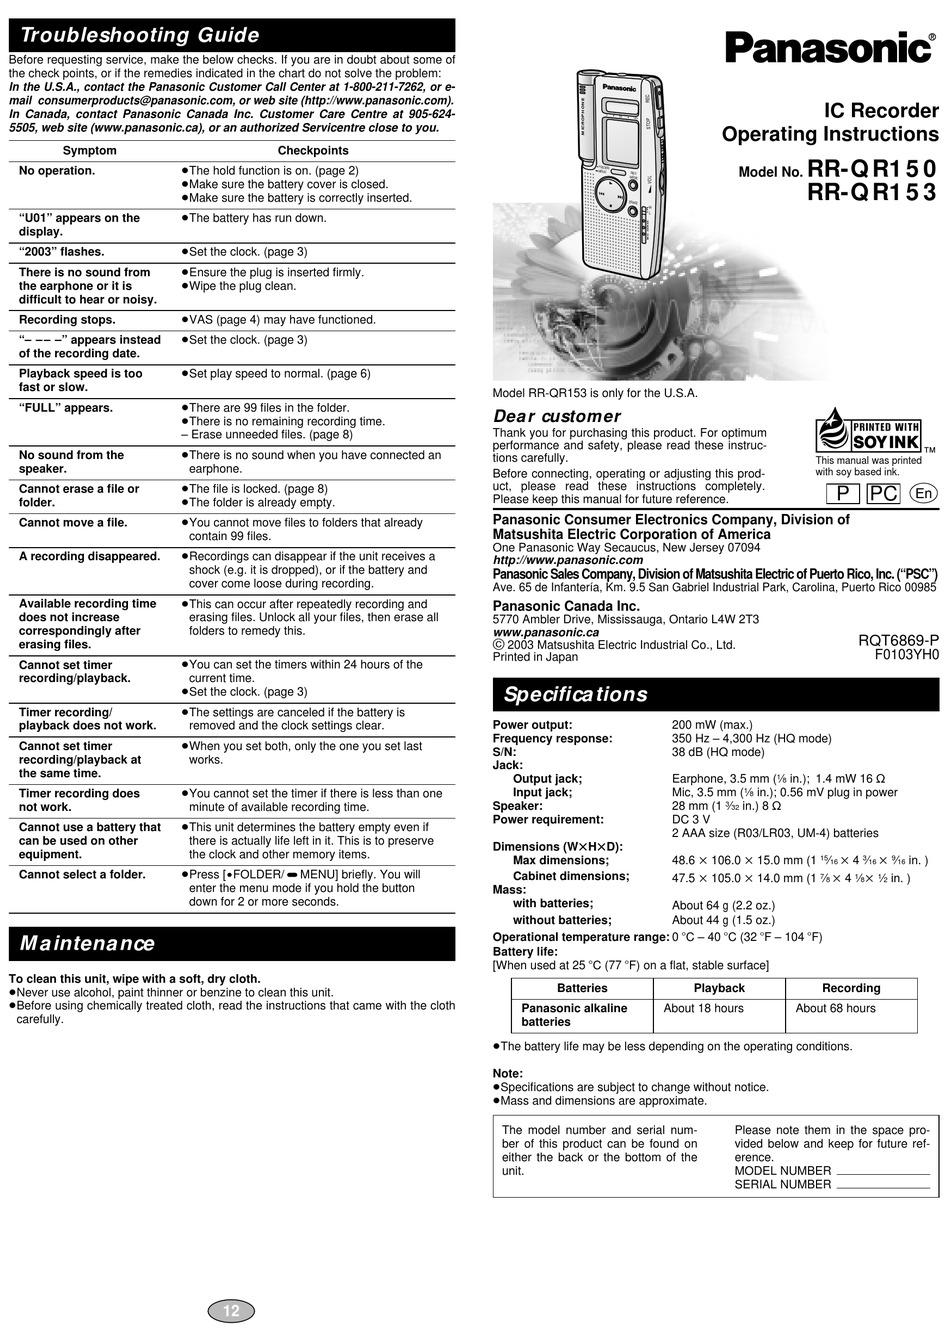 PANASONIC RR-QR150 OPERATING INSTRUCTIONS MANUAL Pdf